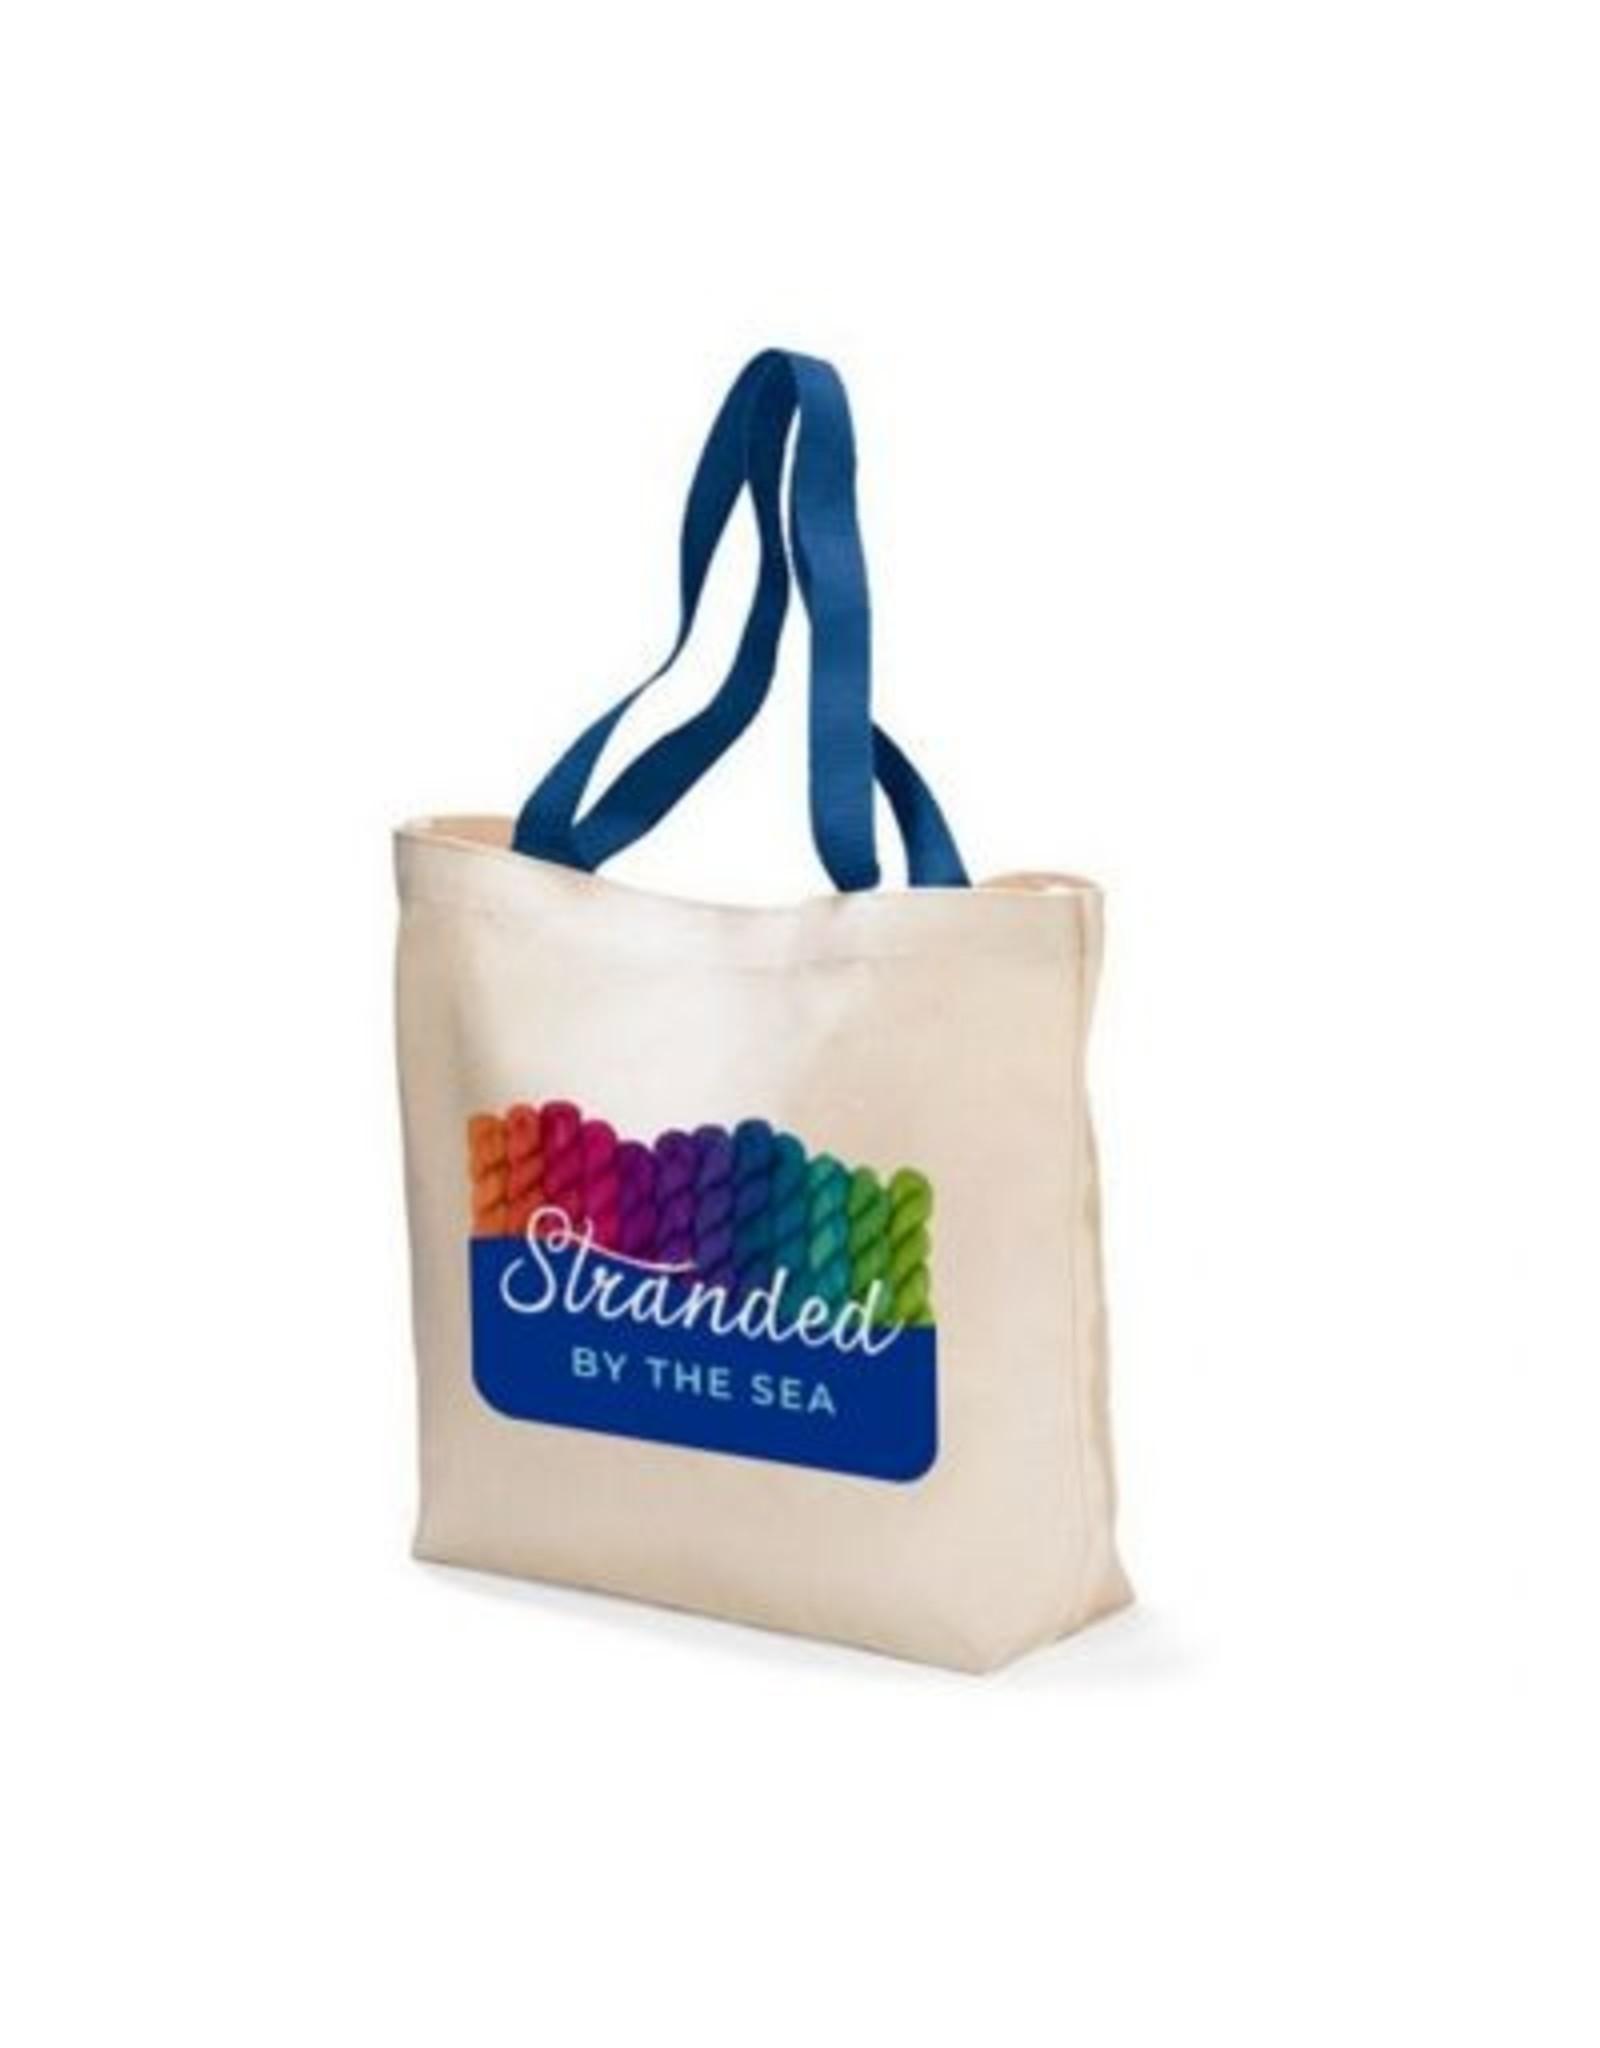 Stranded by the Sea Stranded Shopper Tote Bag